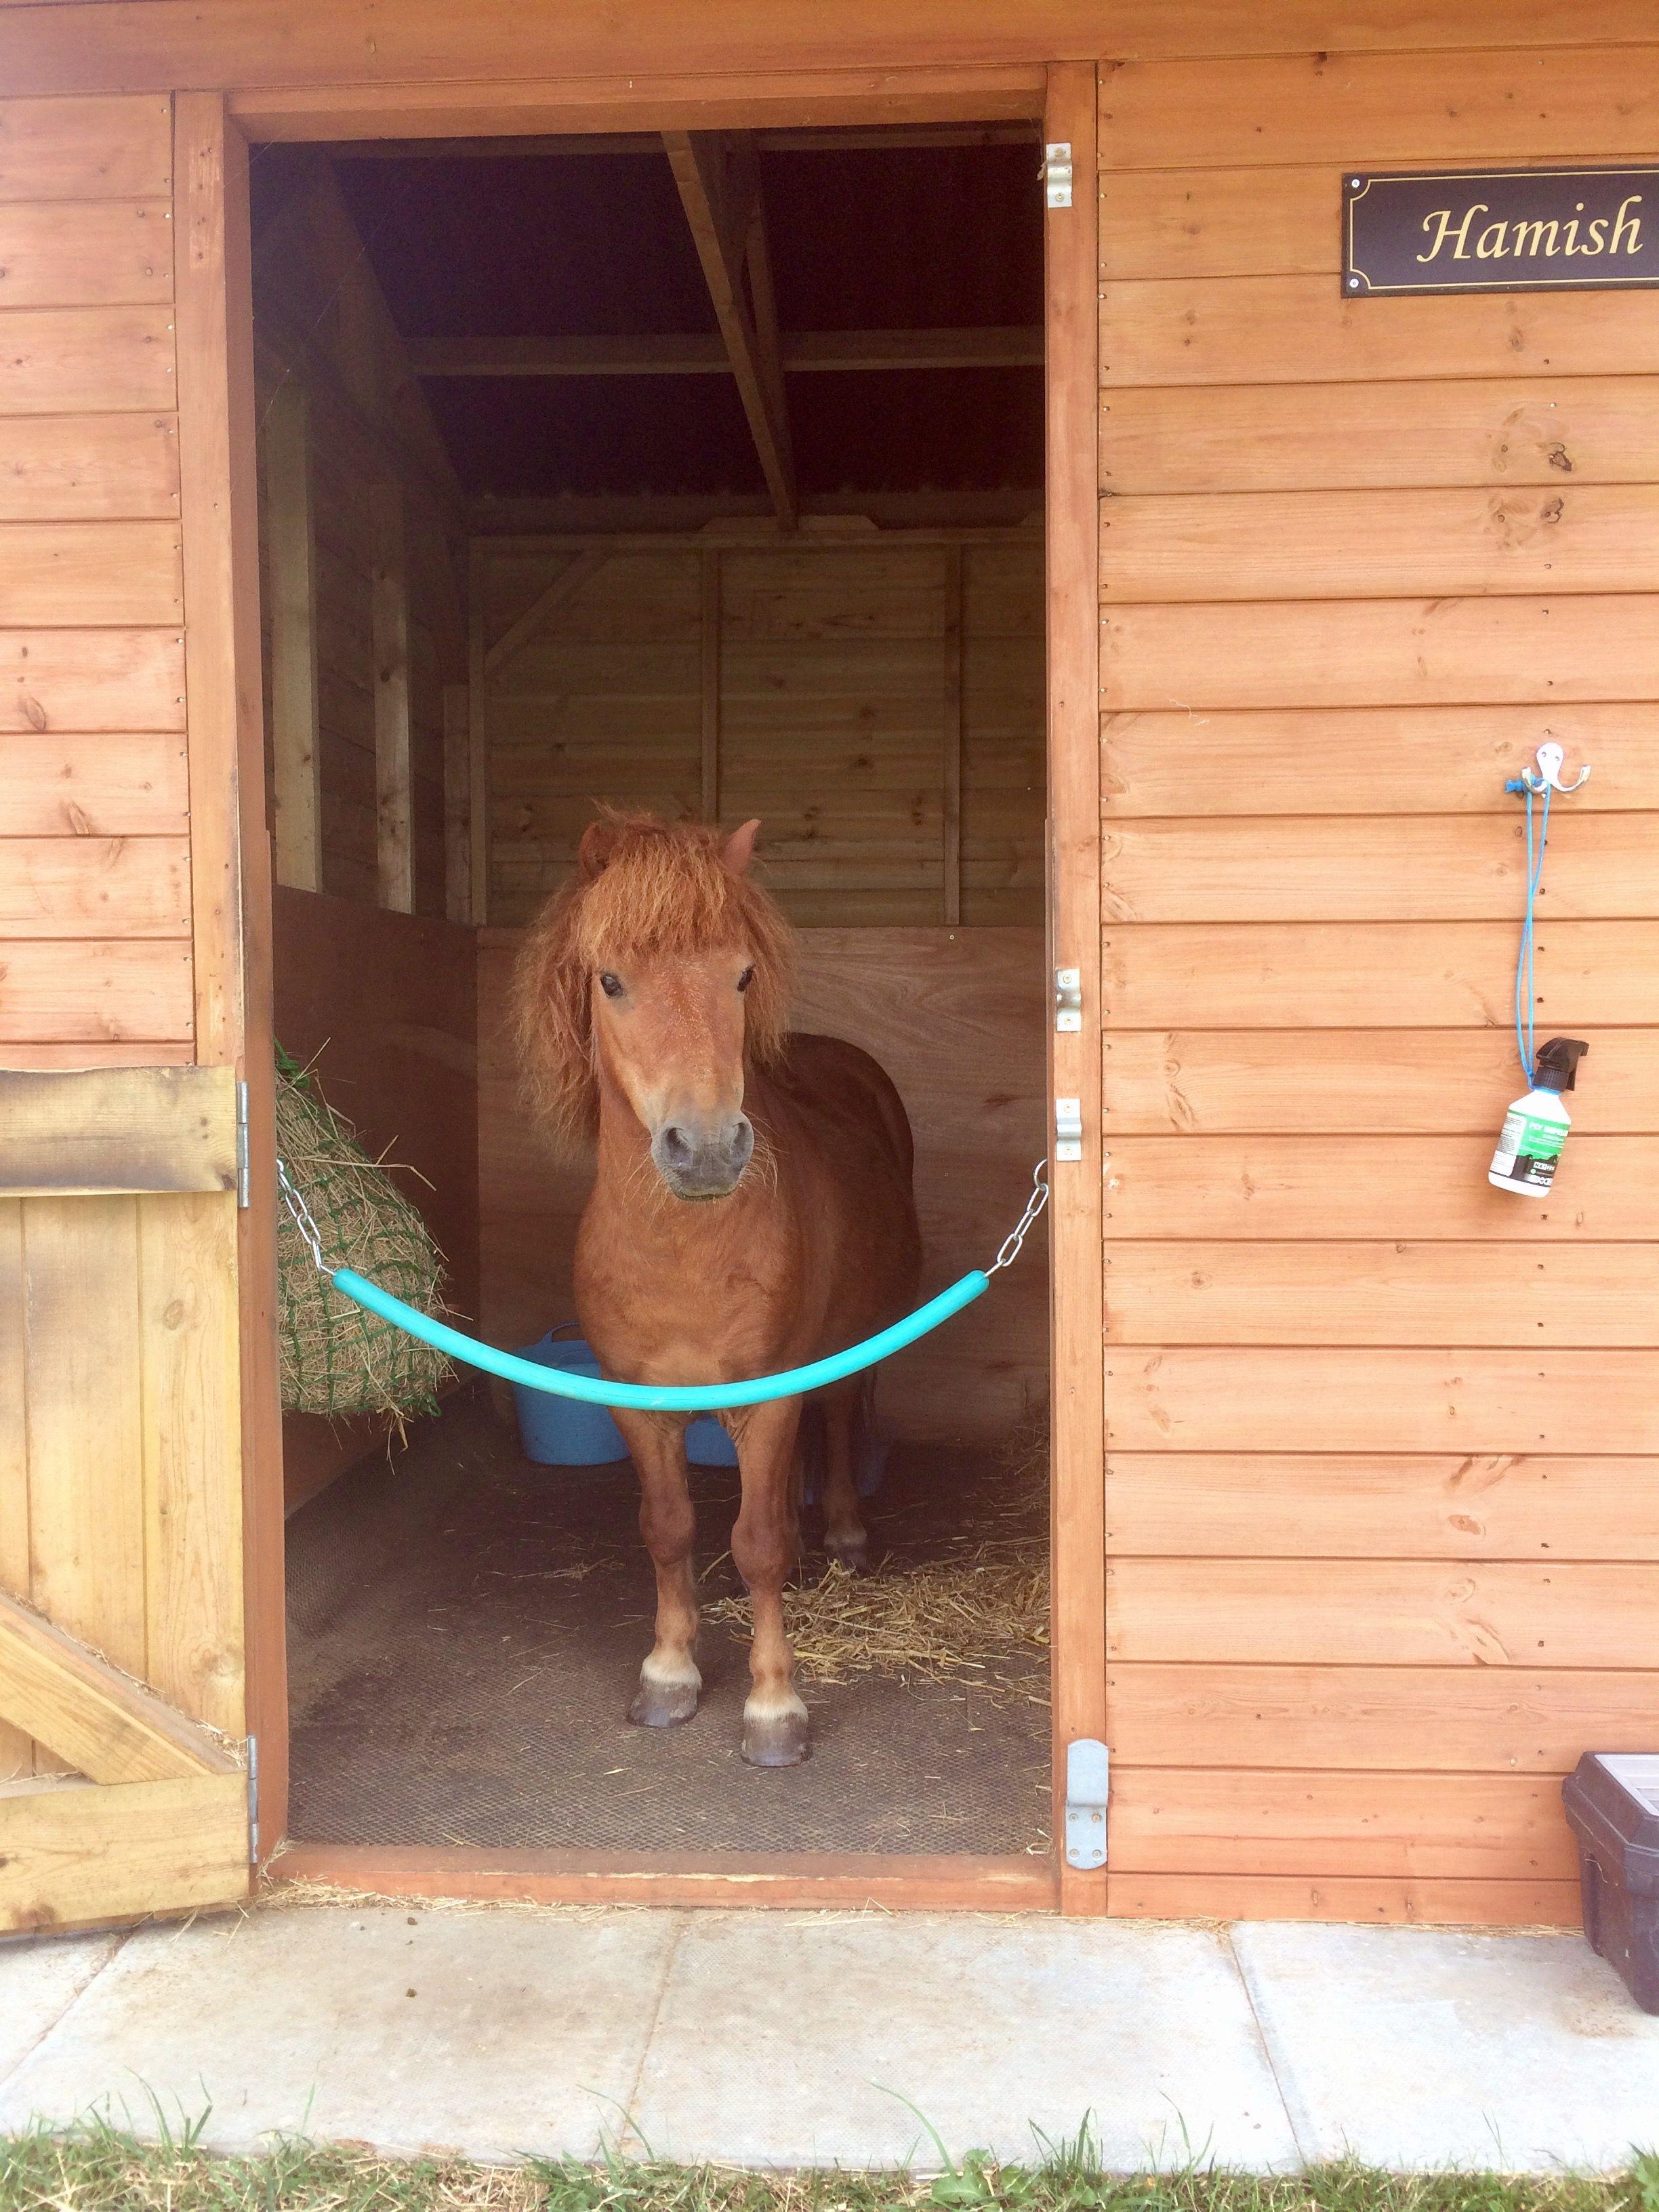 Hamish The Shetland Pony In His Stable Mini Horse Barn Dream Horse Barns Mini Pony Mini horse in my backyard